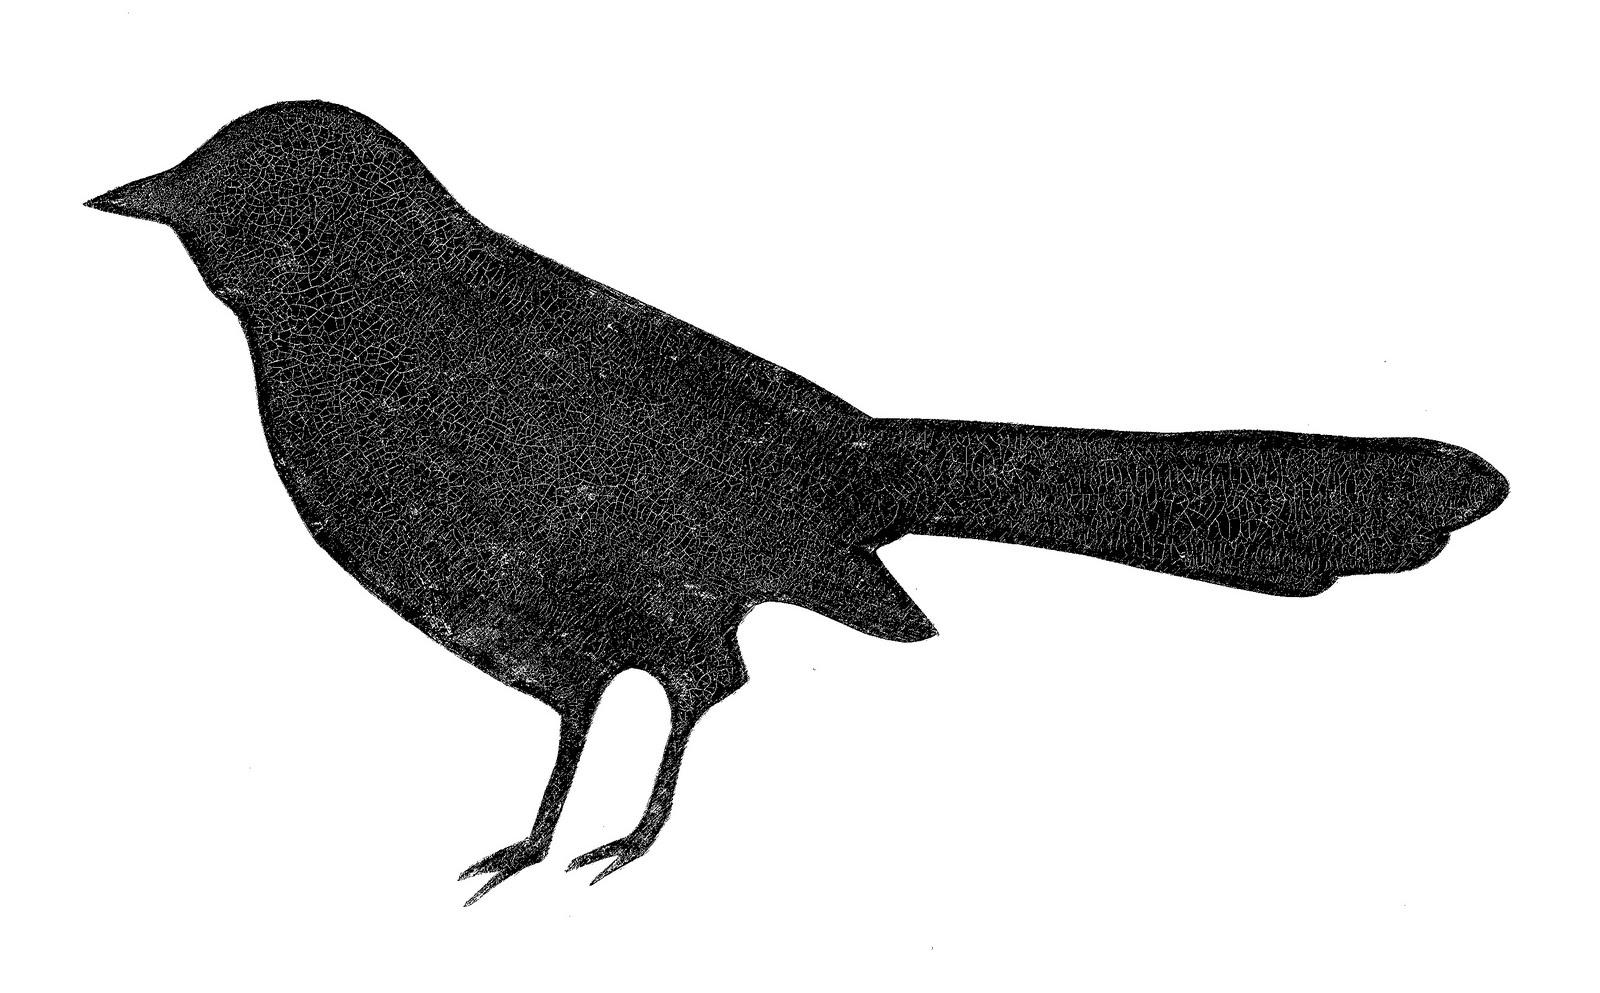 Crackle black bird clip art